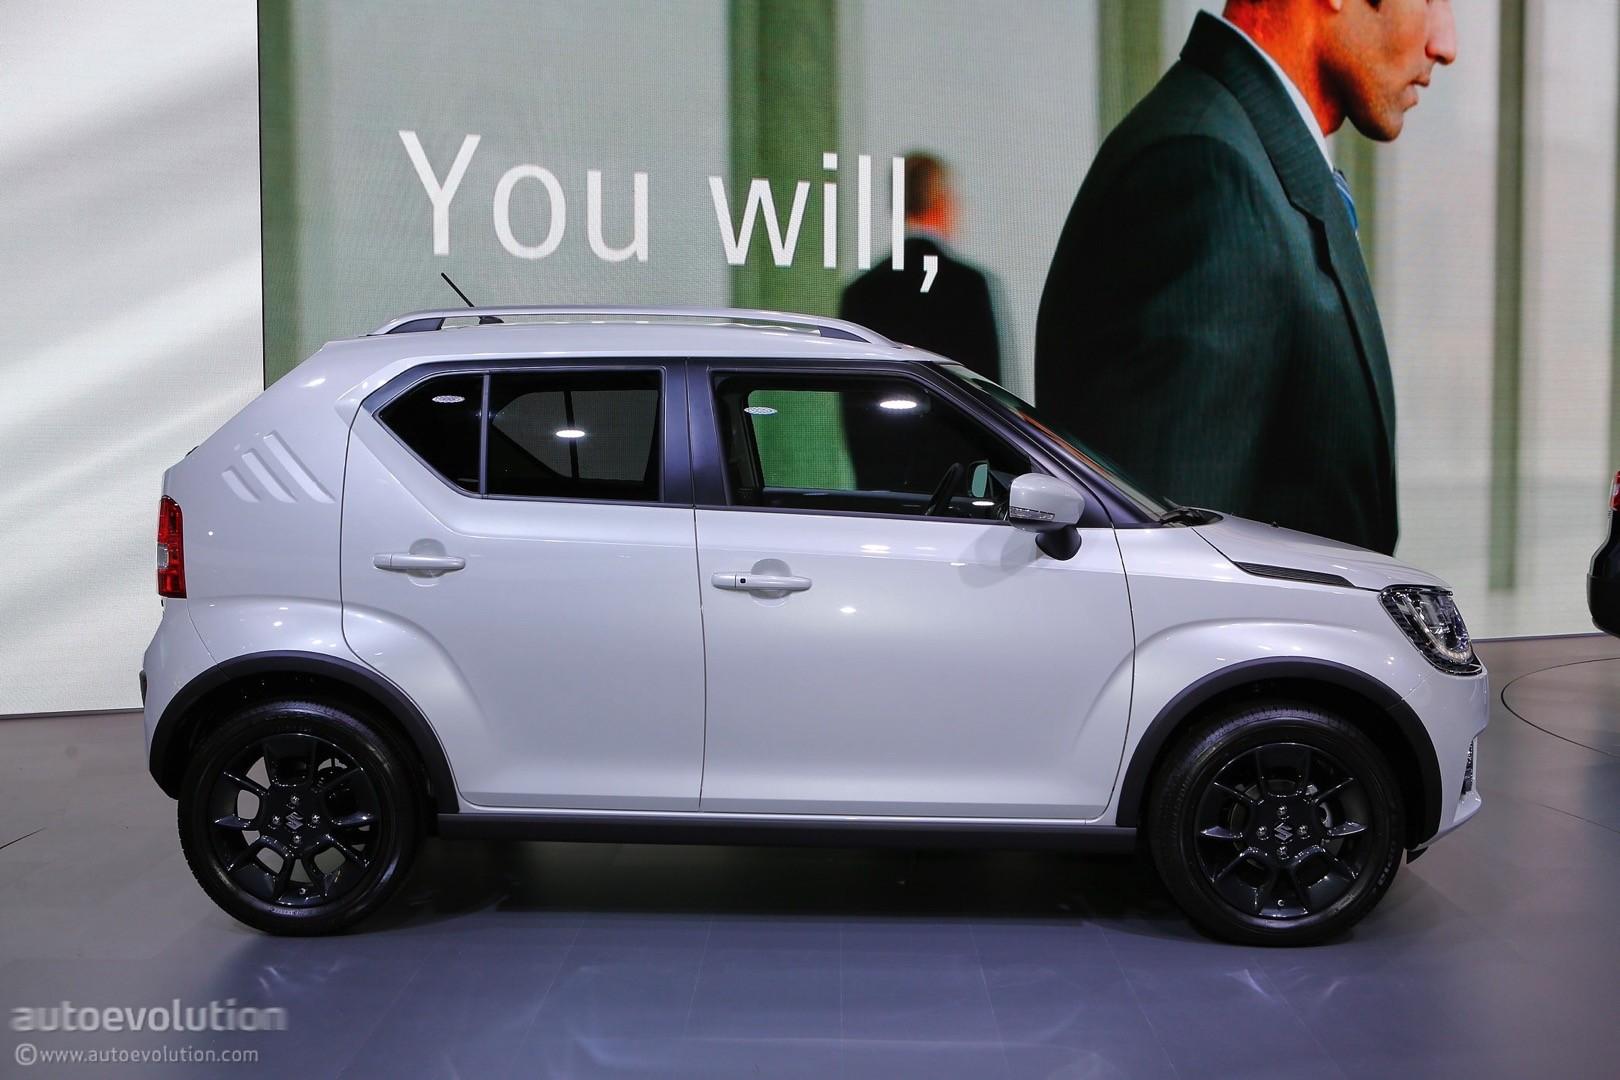 Beautiful 2017 Suzuki Ignis Price Set For Europe 9999 In The UK